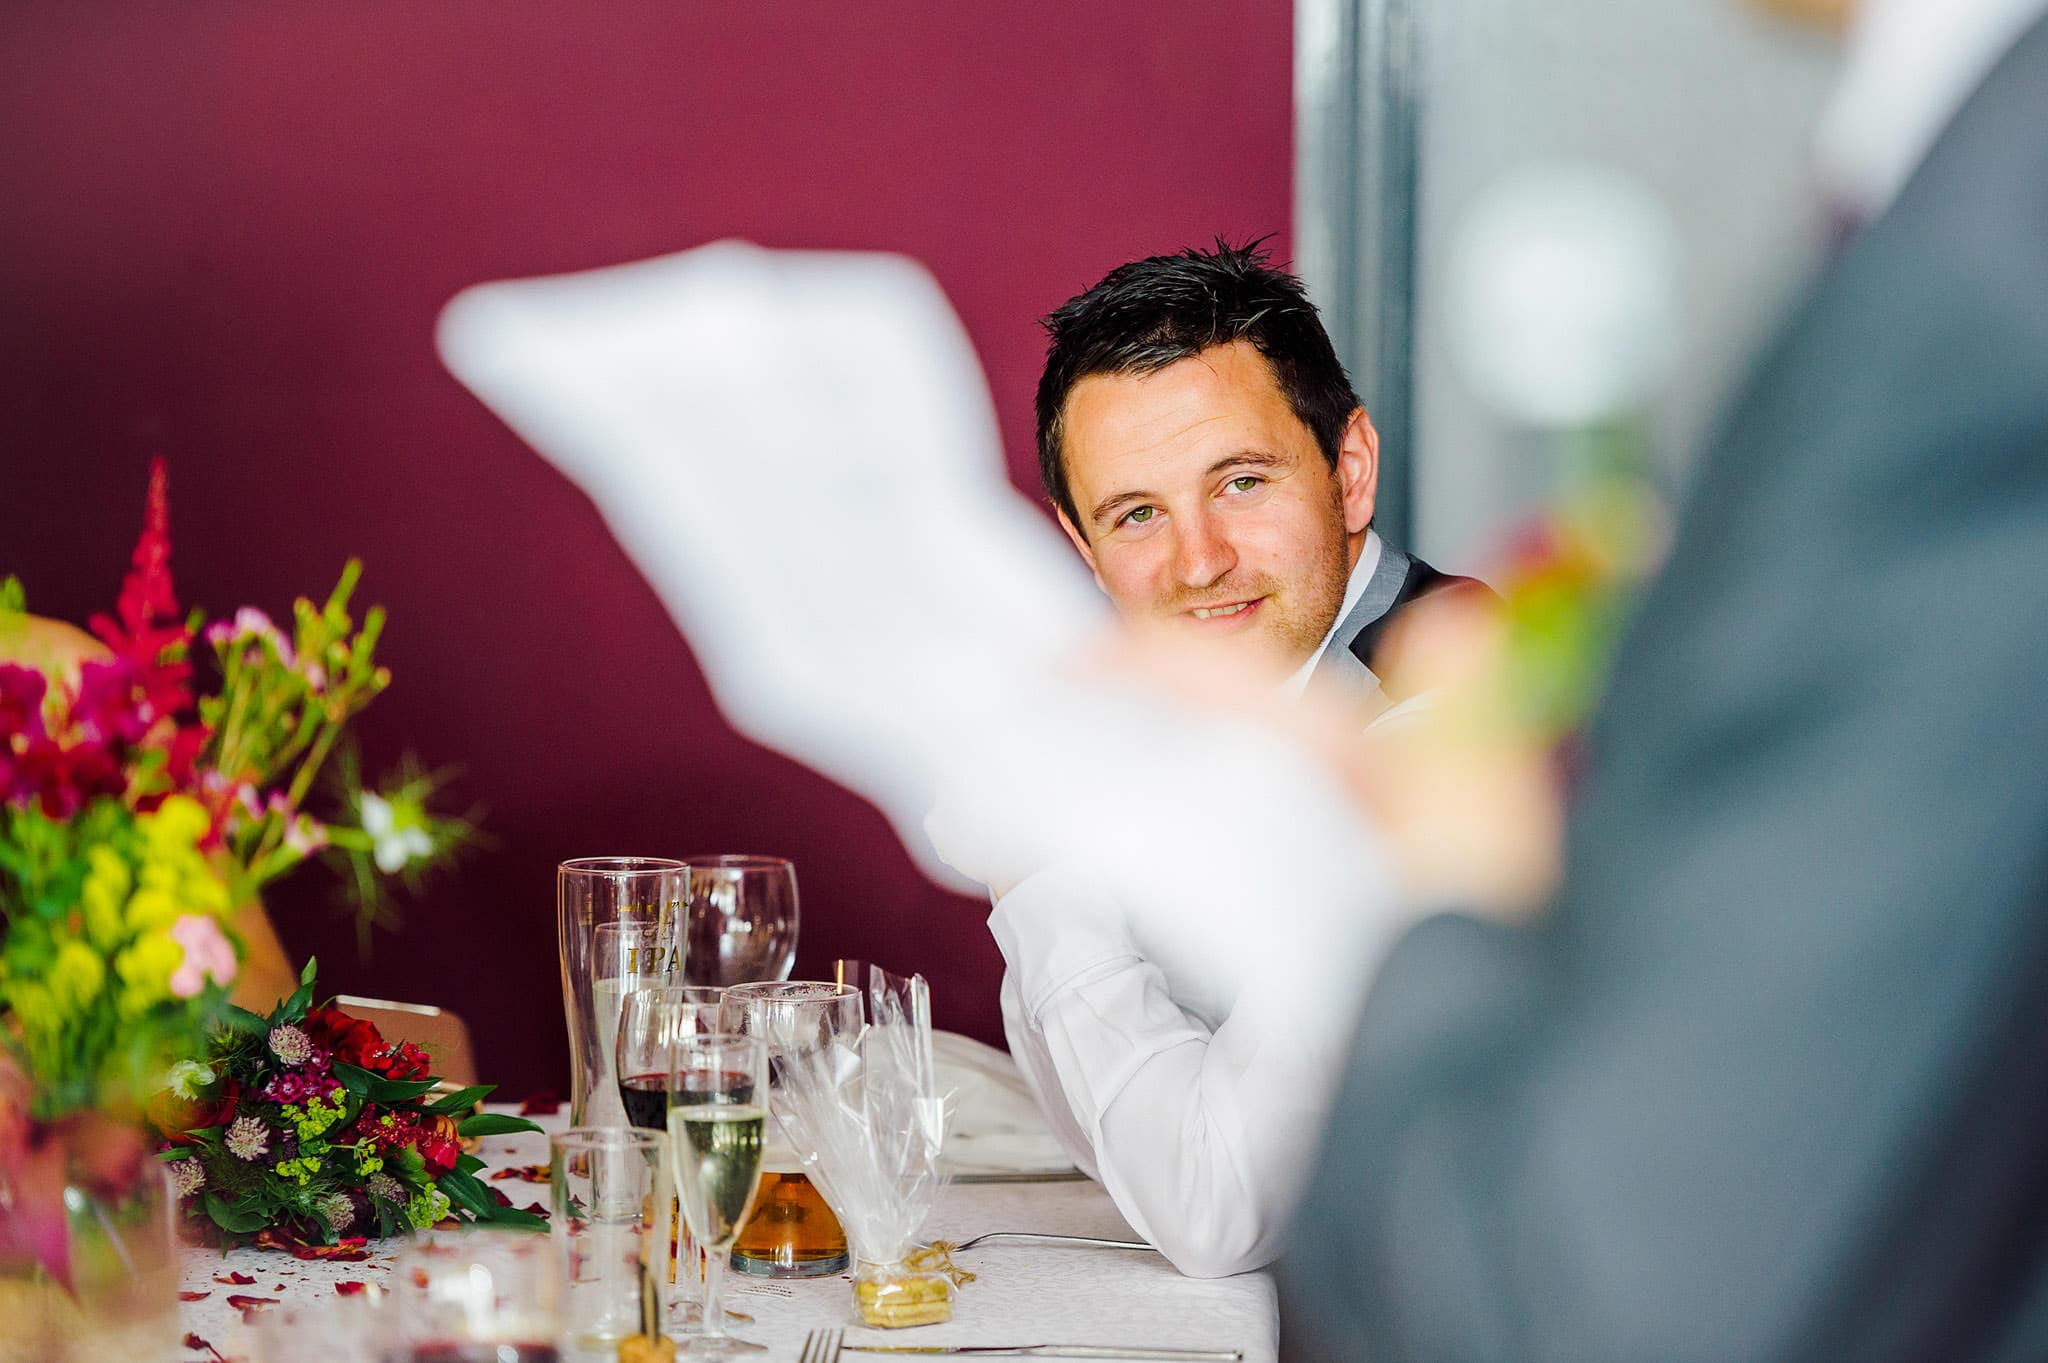 wedding-photographer-aberystwyth-wales (202)